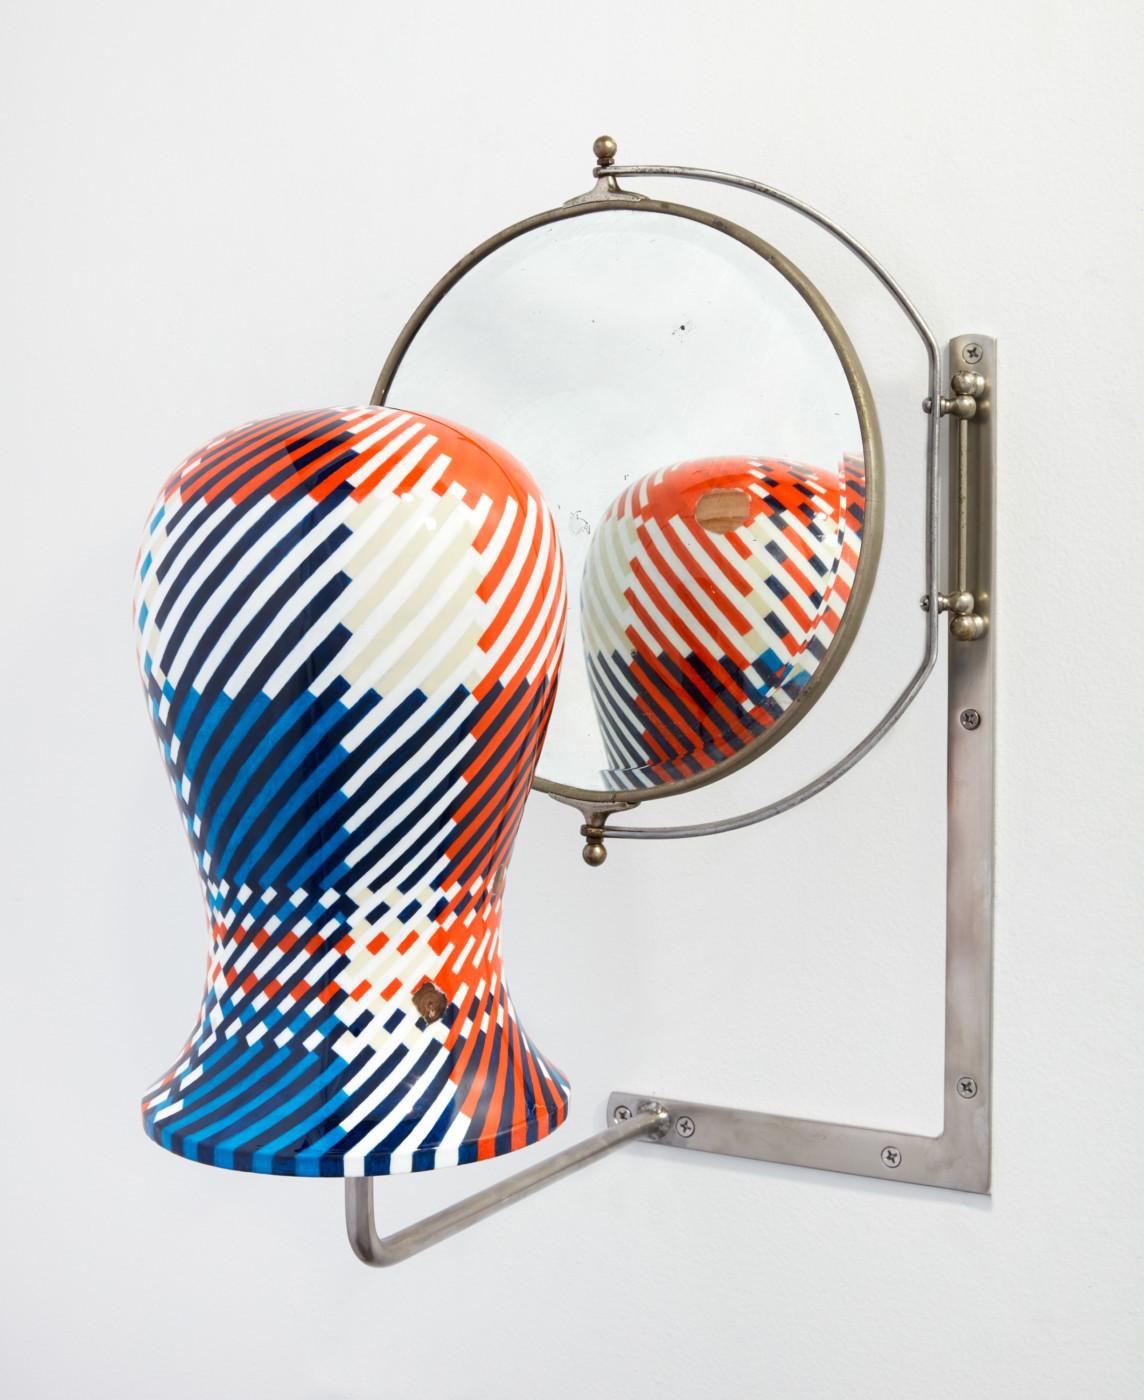 ORION MARTIN  Tête fig. 5 , 2019 Acrylic, enamel, wood, steel, mirror 53 x 37 x 38,5 cm /  20.8 x 14.5 x 15.18 in - High Art Gallery Paris